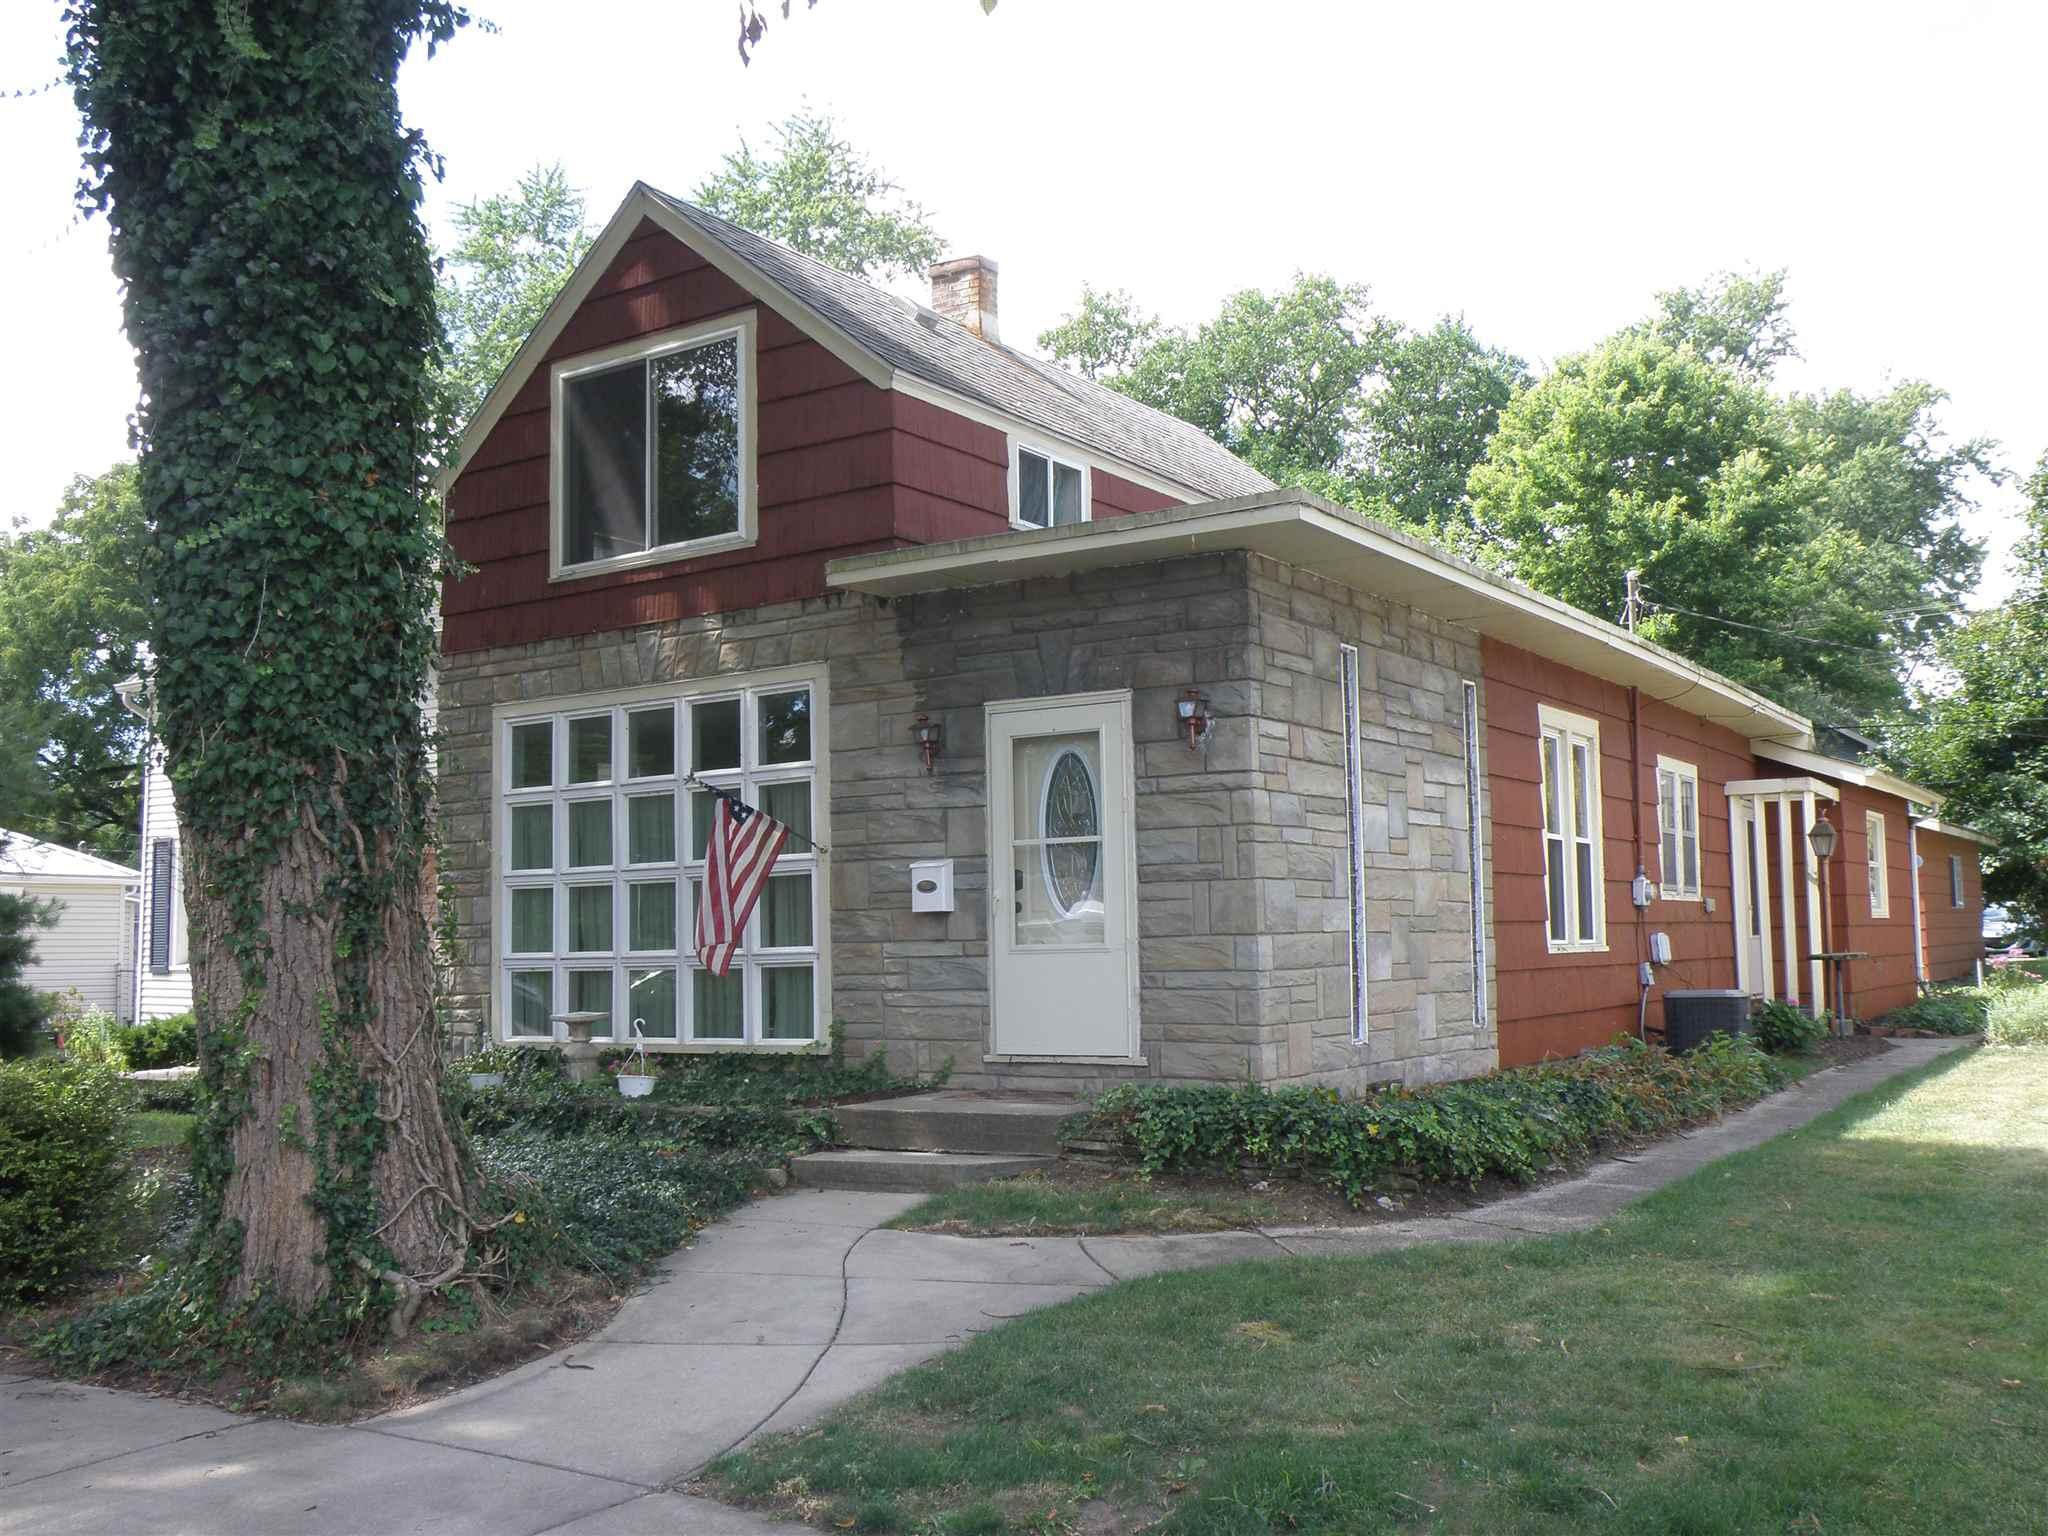 217 Kenwood Elkhart, IN 46517